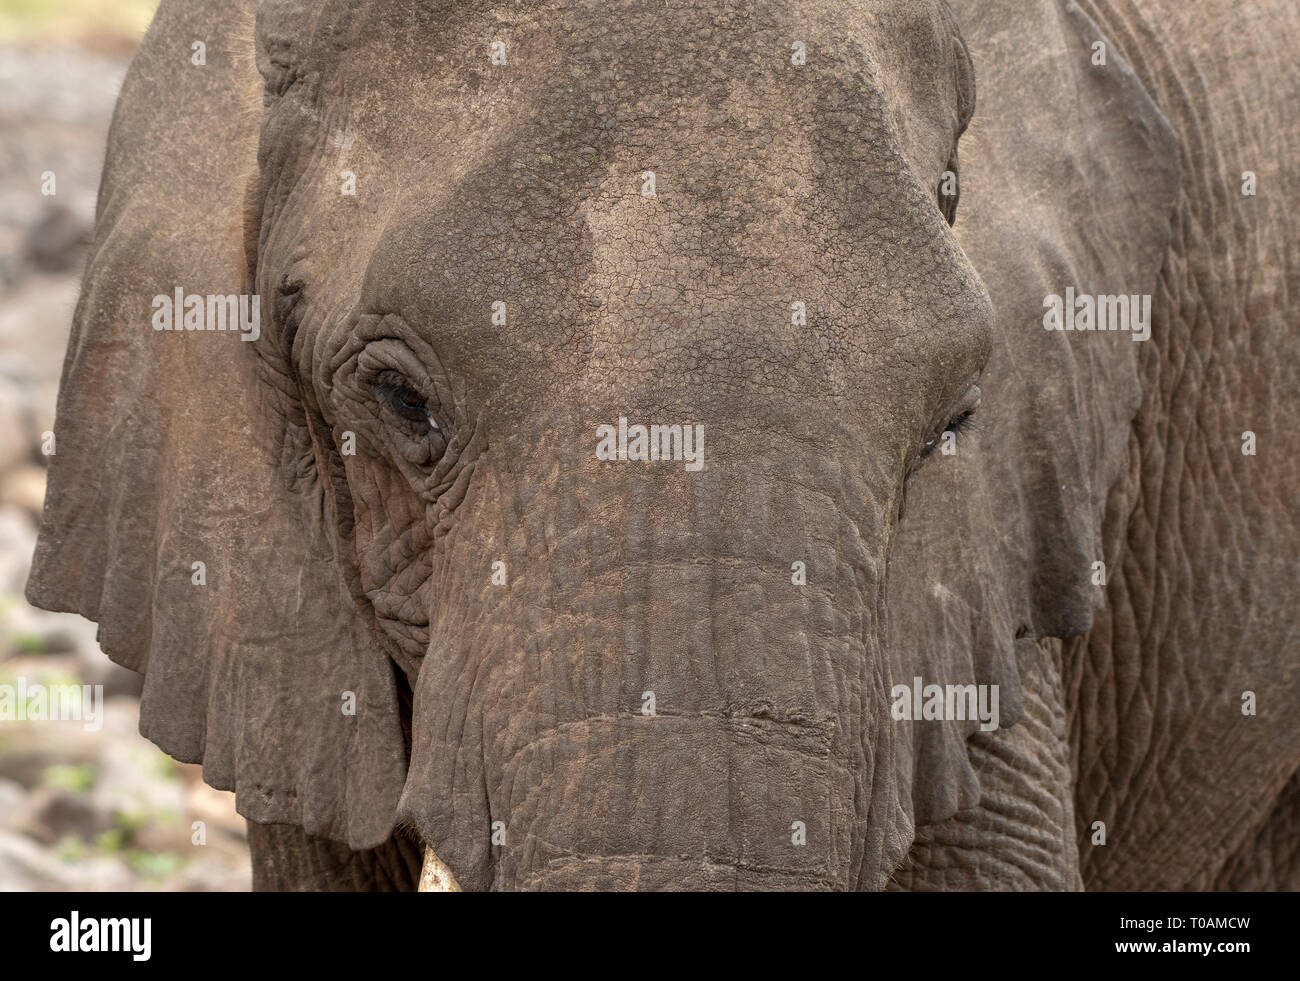 Close-up of an African Elephant, Loxodonta africana, in Lake Manyara National Park, Tanzania - Stock Image